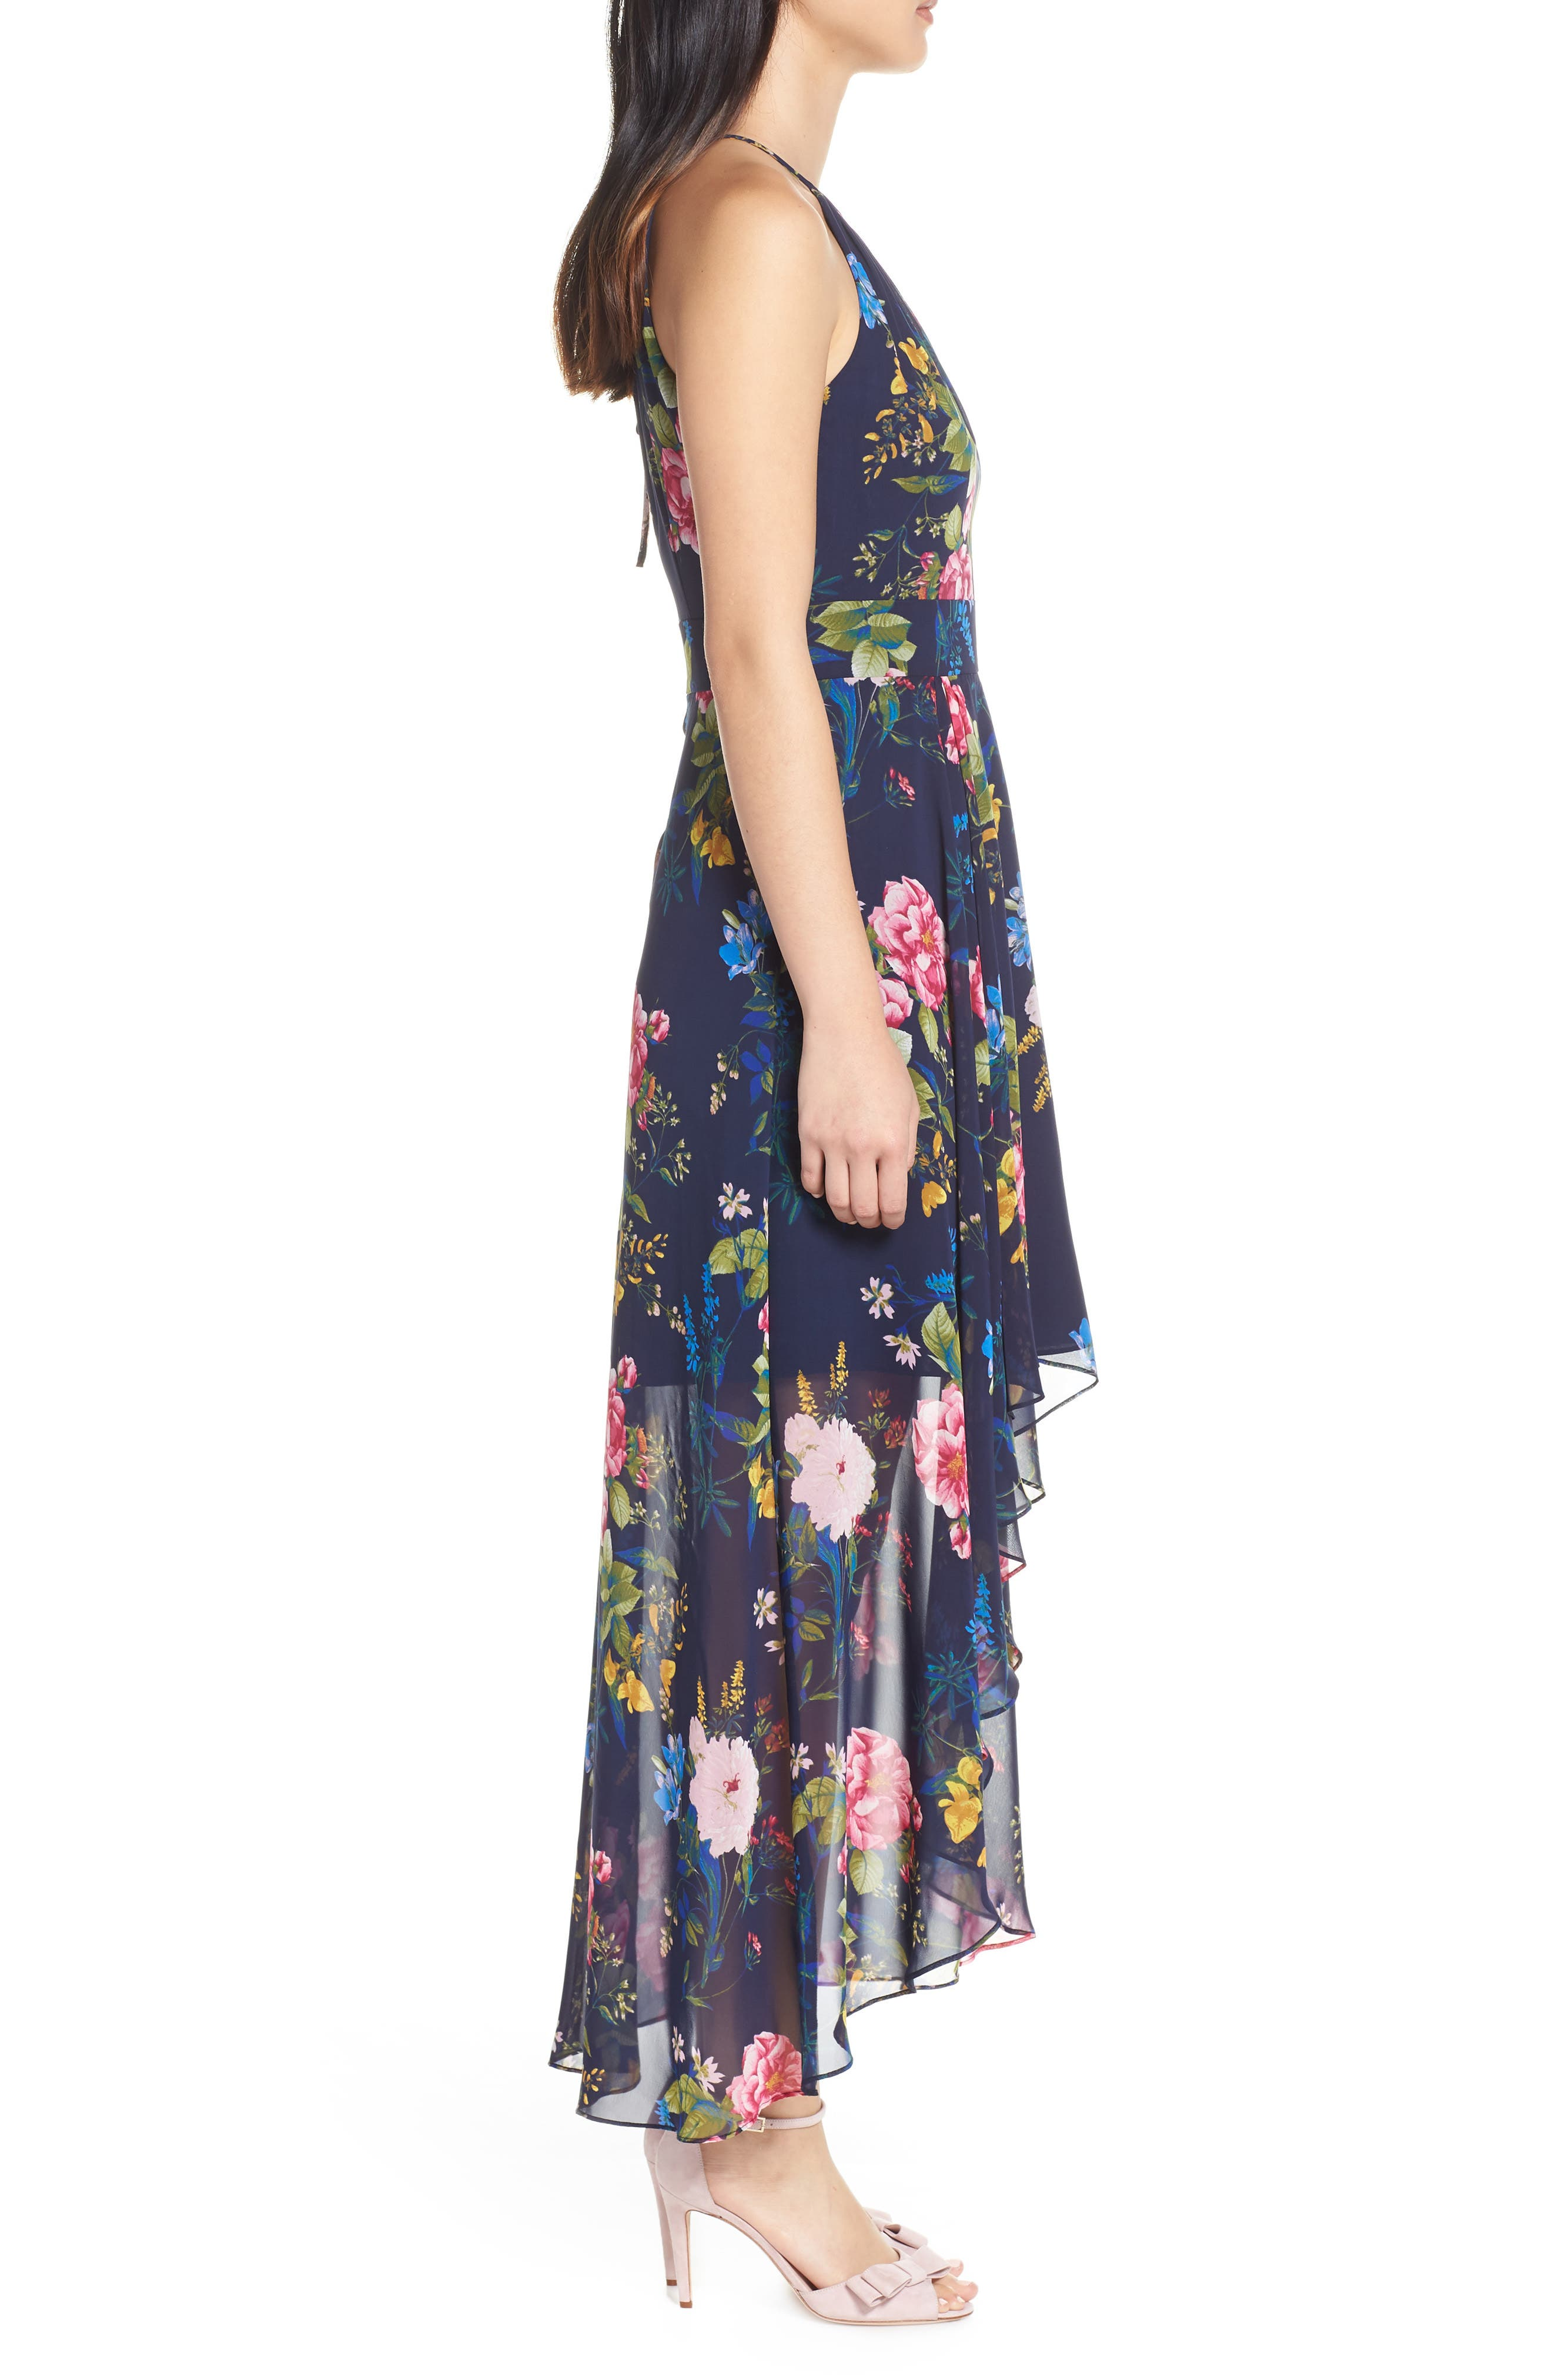 ELIZA J, Floral Print Chiffon Halter Dress, Alternate thumbnail 4, color, NAVY